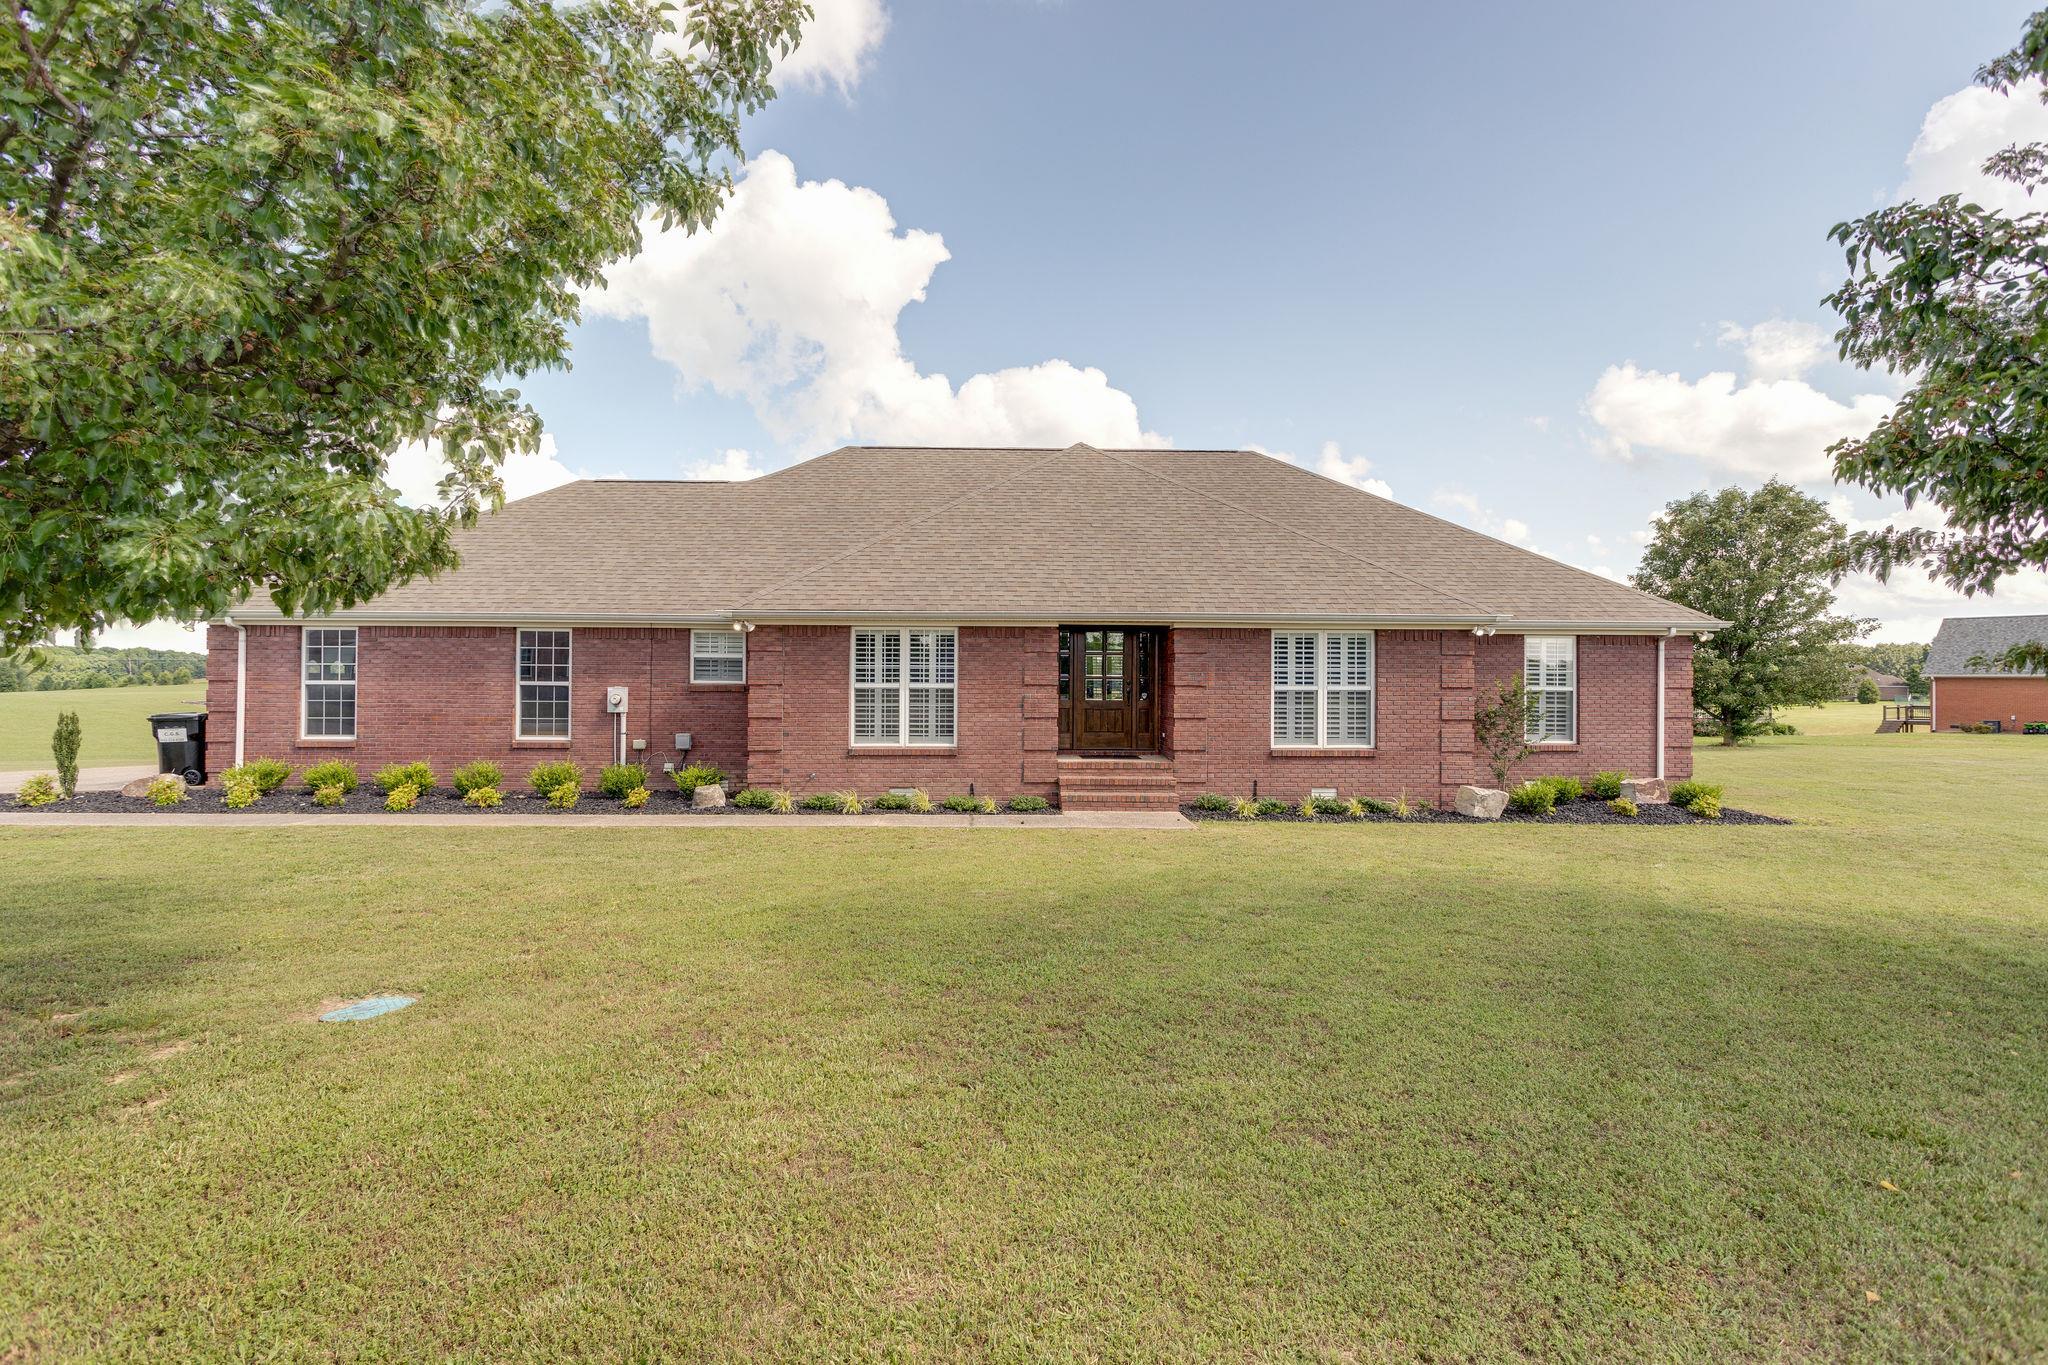 163 Tabor Pl, Hohenwald, TN 38462 - Hohenwald, TN real estate listing